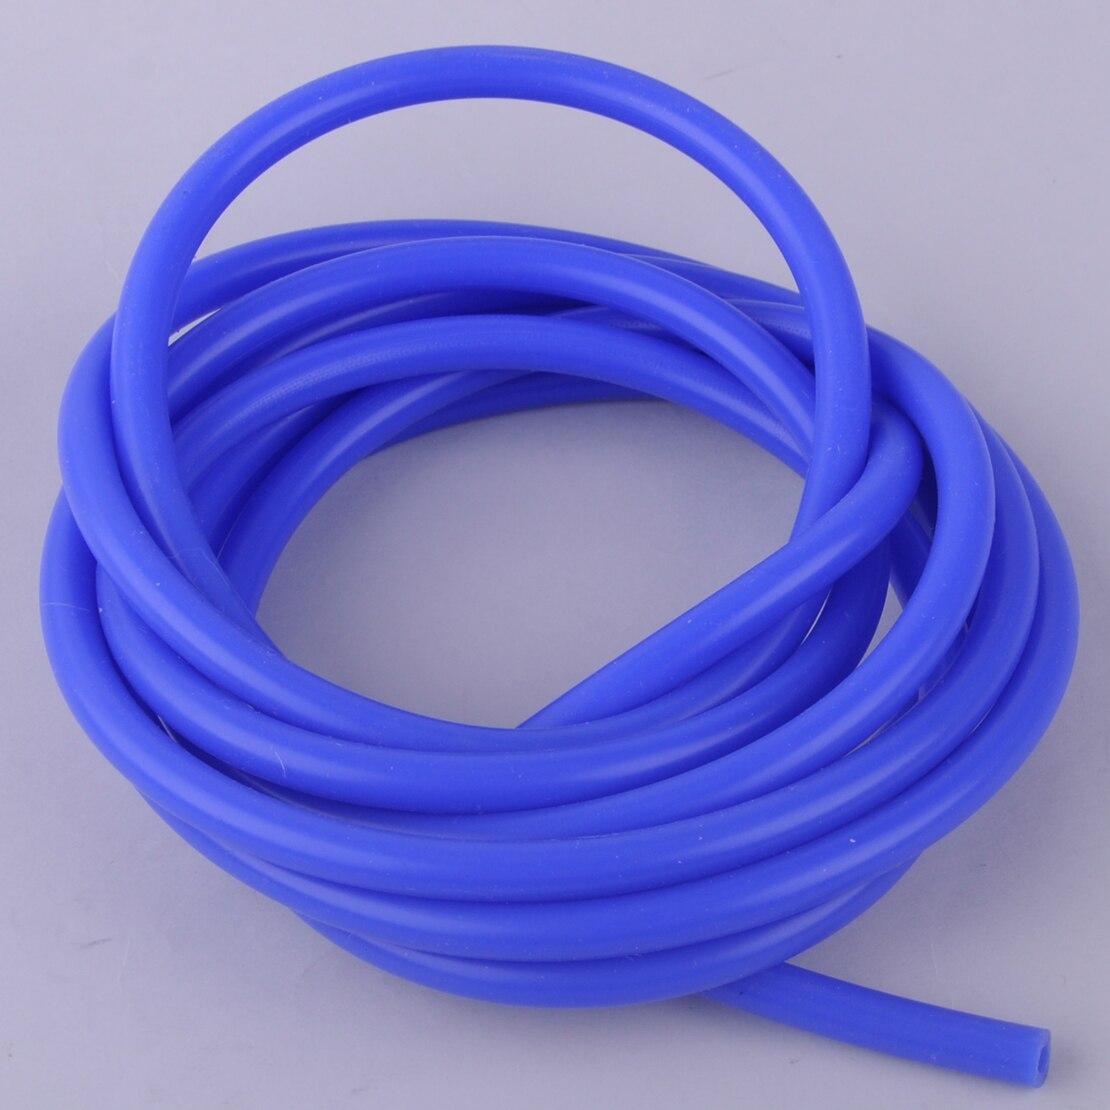 Beler 3 Meters 4mm Blue High Temp Air Intake Engine Silicone Vacuum Tube Hose